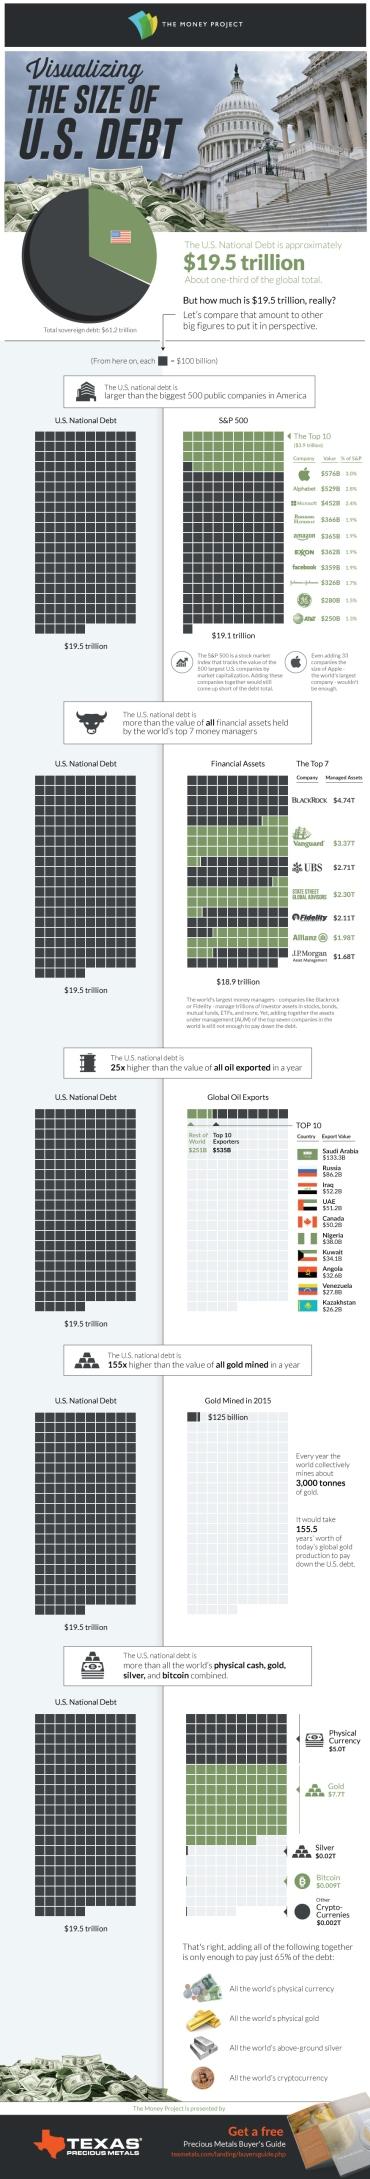 us-national-debt-chart